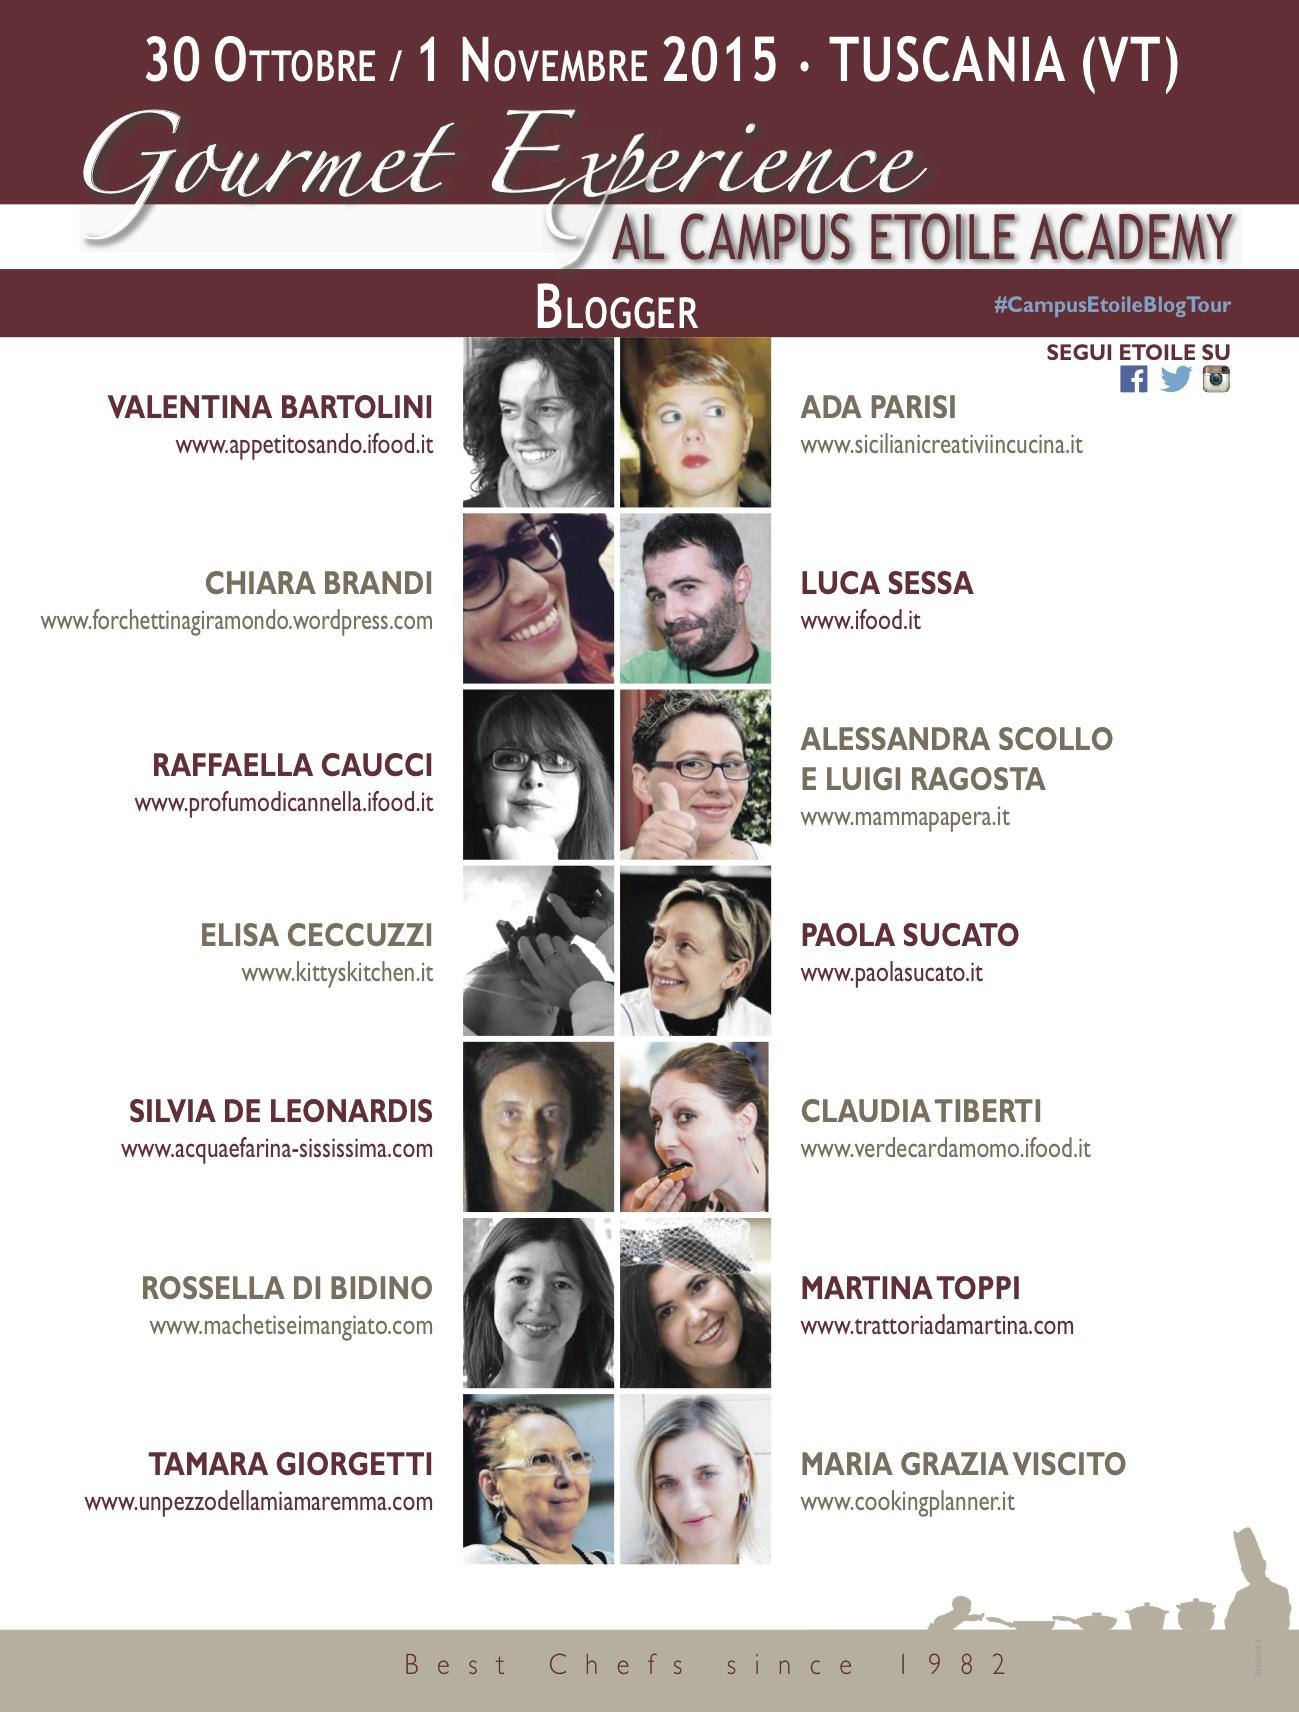 #campusetoileblogtour partecipanti